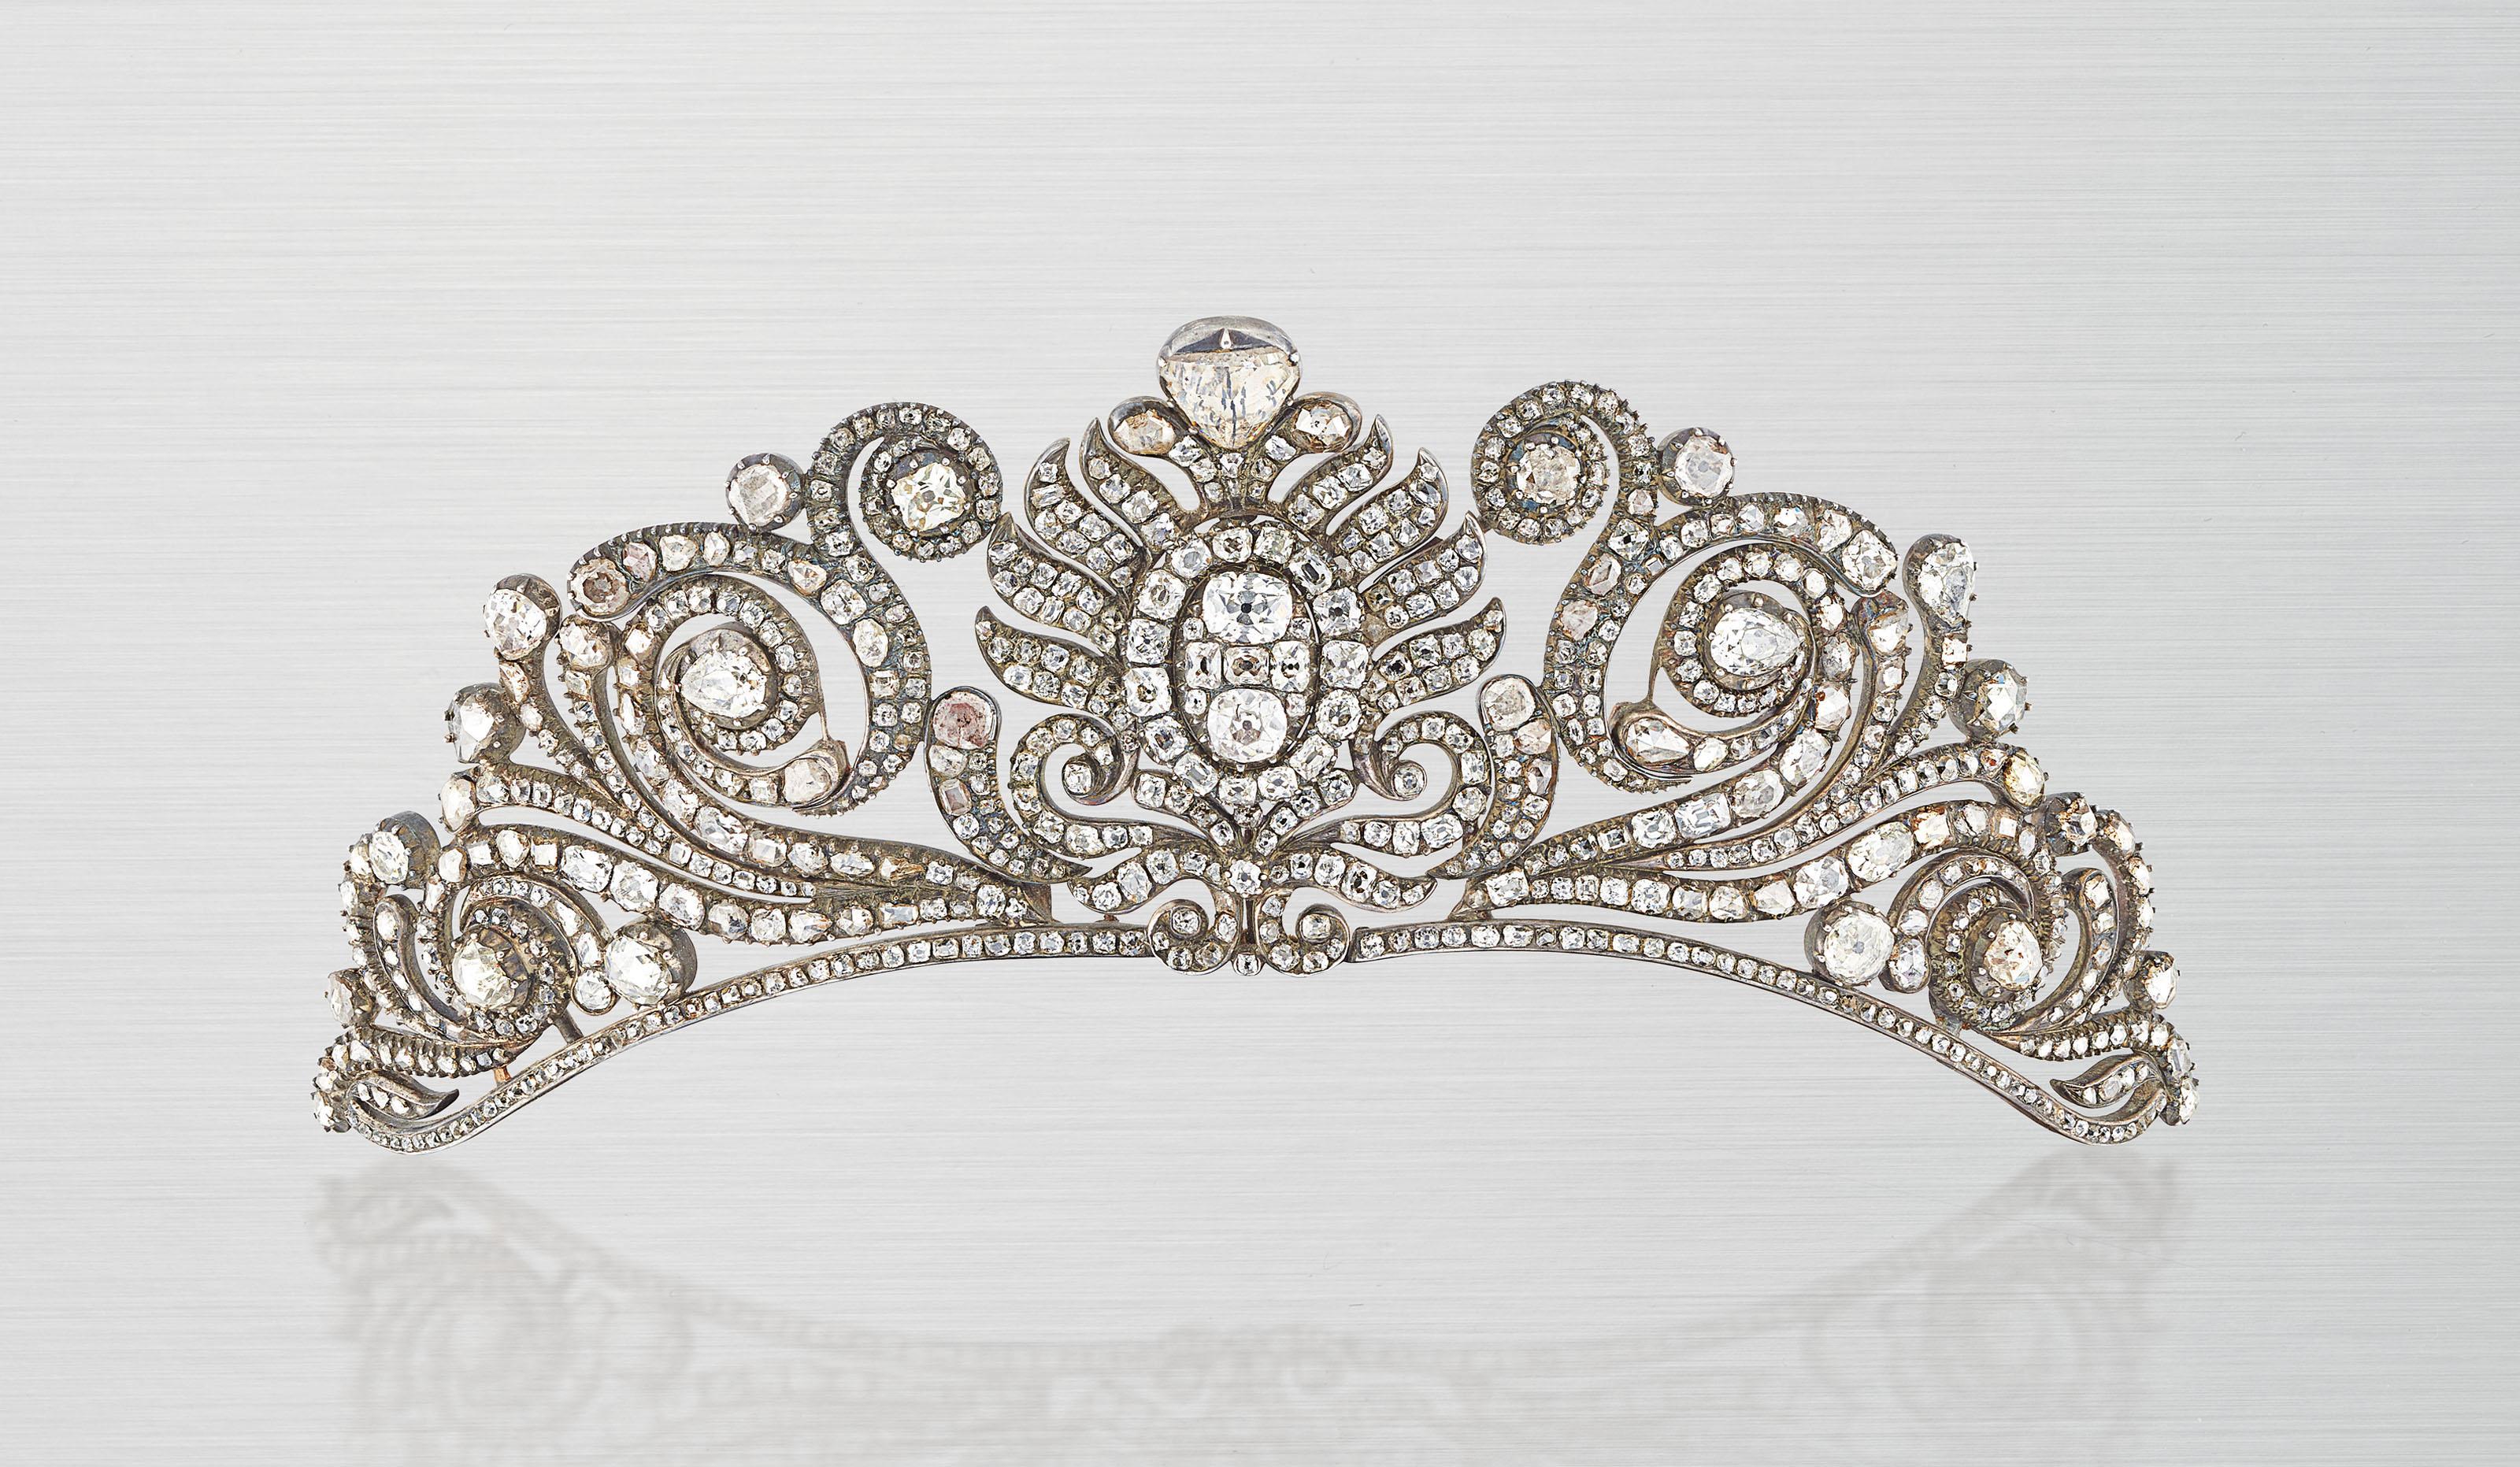 A RARE LATE 18TH / EARLY 19TH CENTURY DIAMOND TIARA